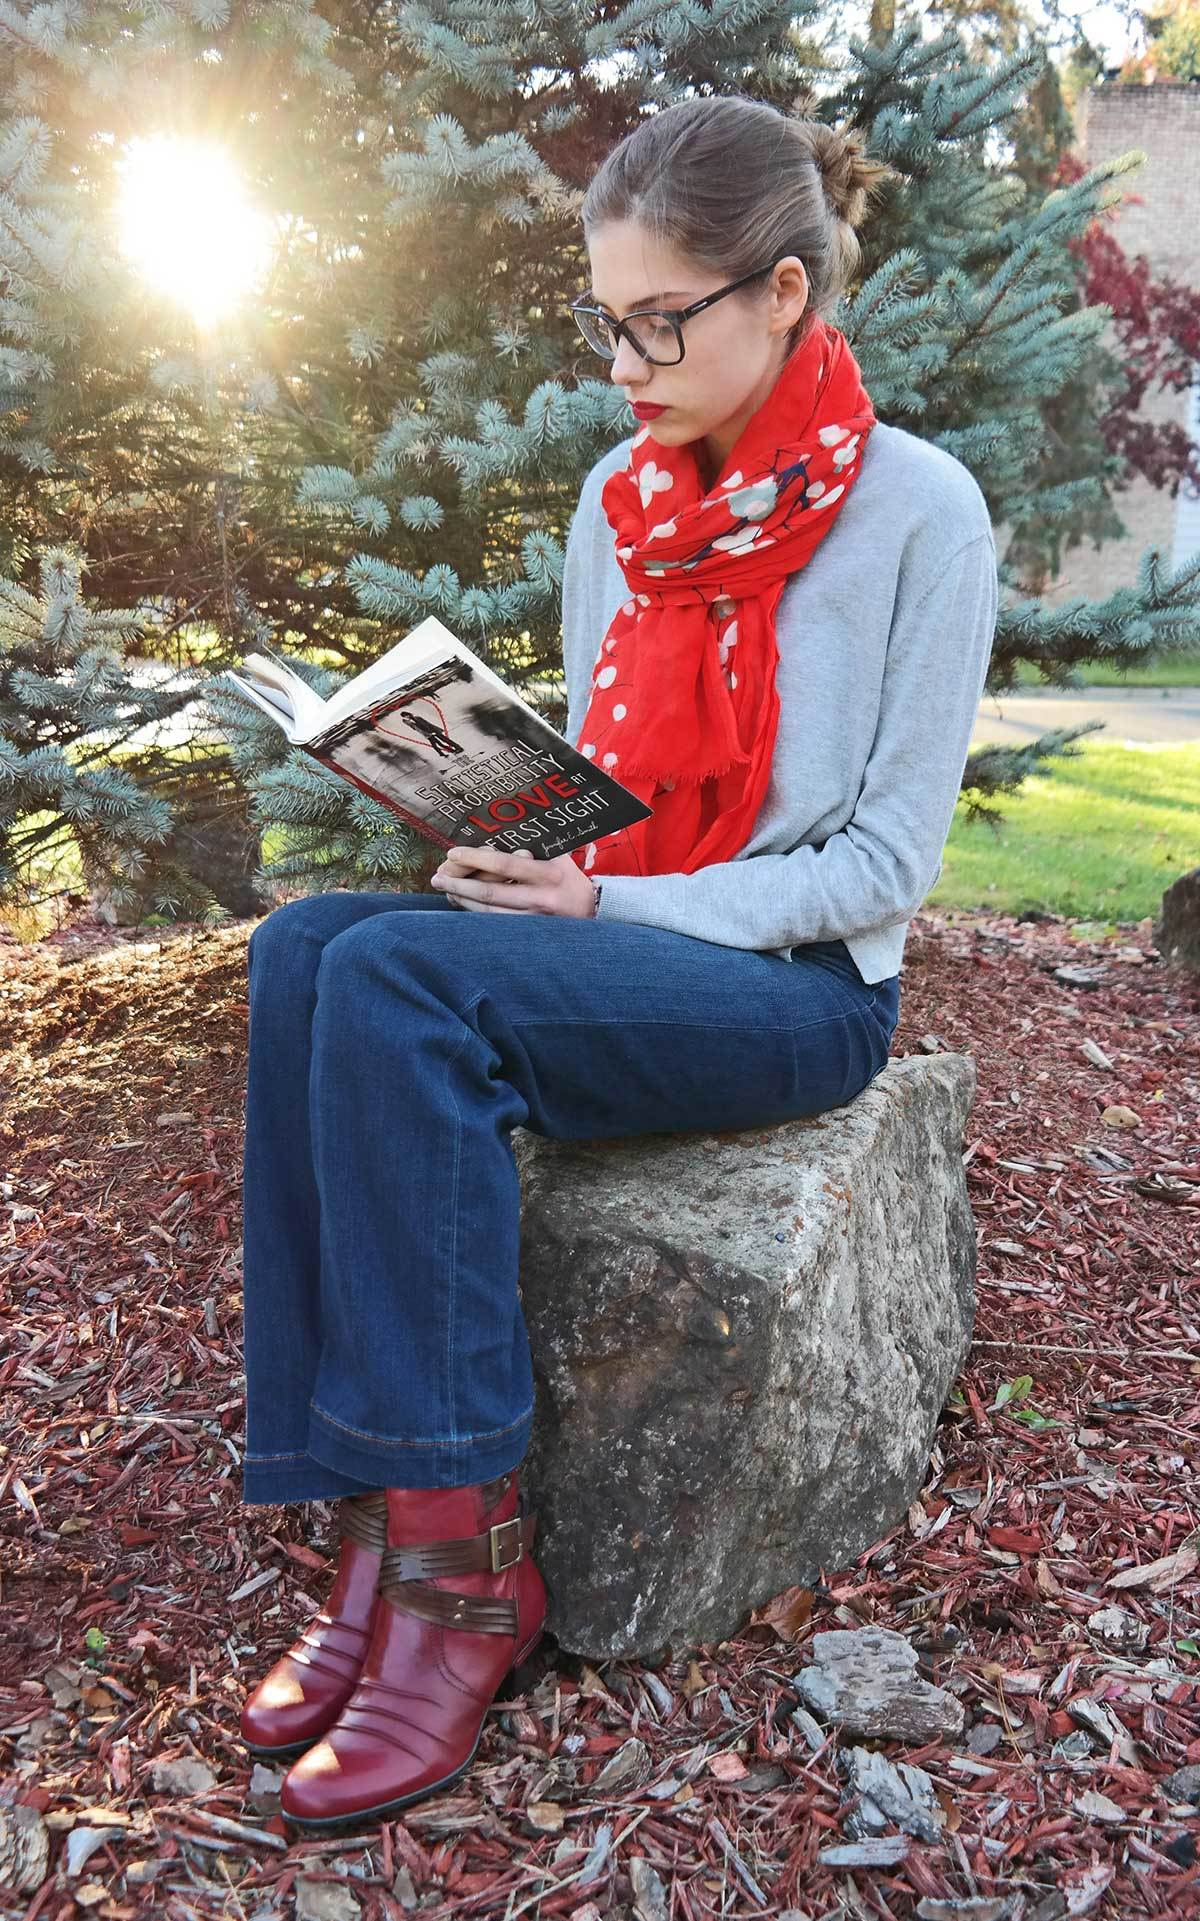 isabella-reading-book